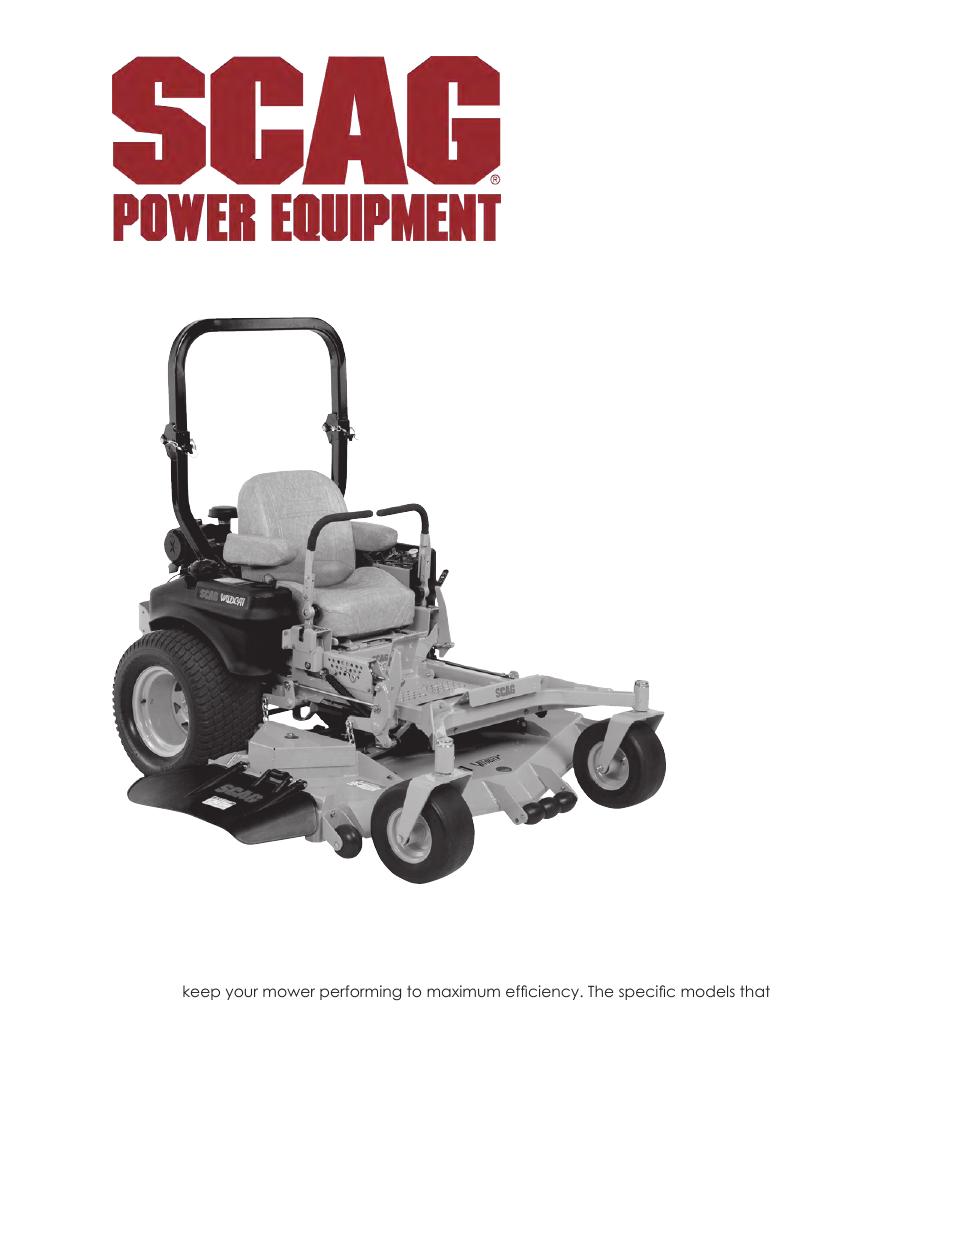 scag power equipment wildcat stwc48v 25cv user manual 122 pages rh manualsdir com Scag Turf Tiger Parts Scag Turf Tiger Parts